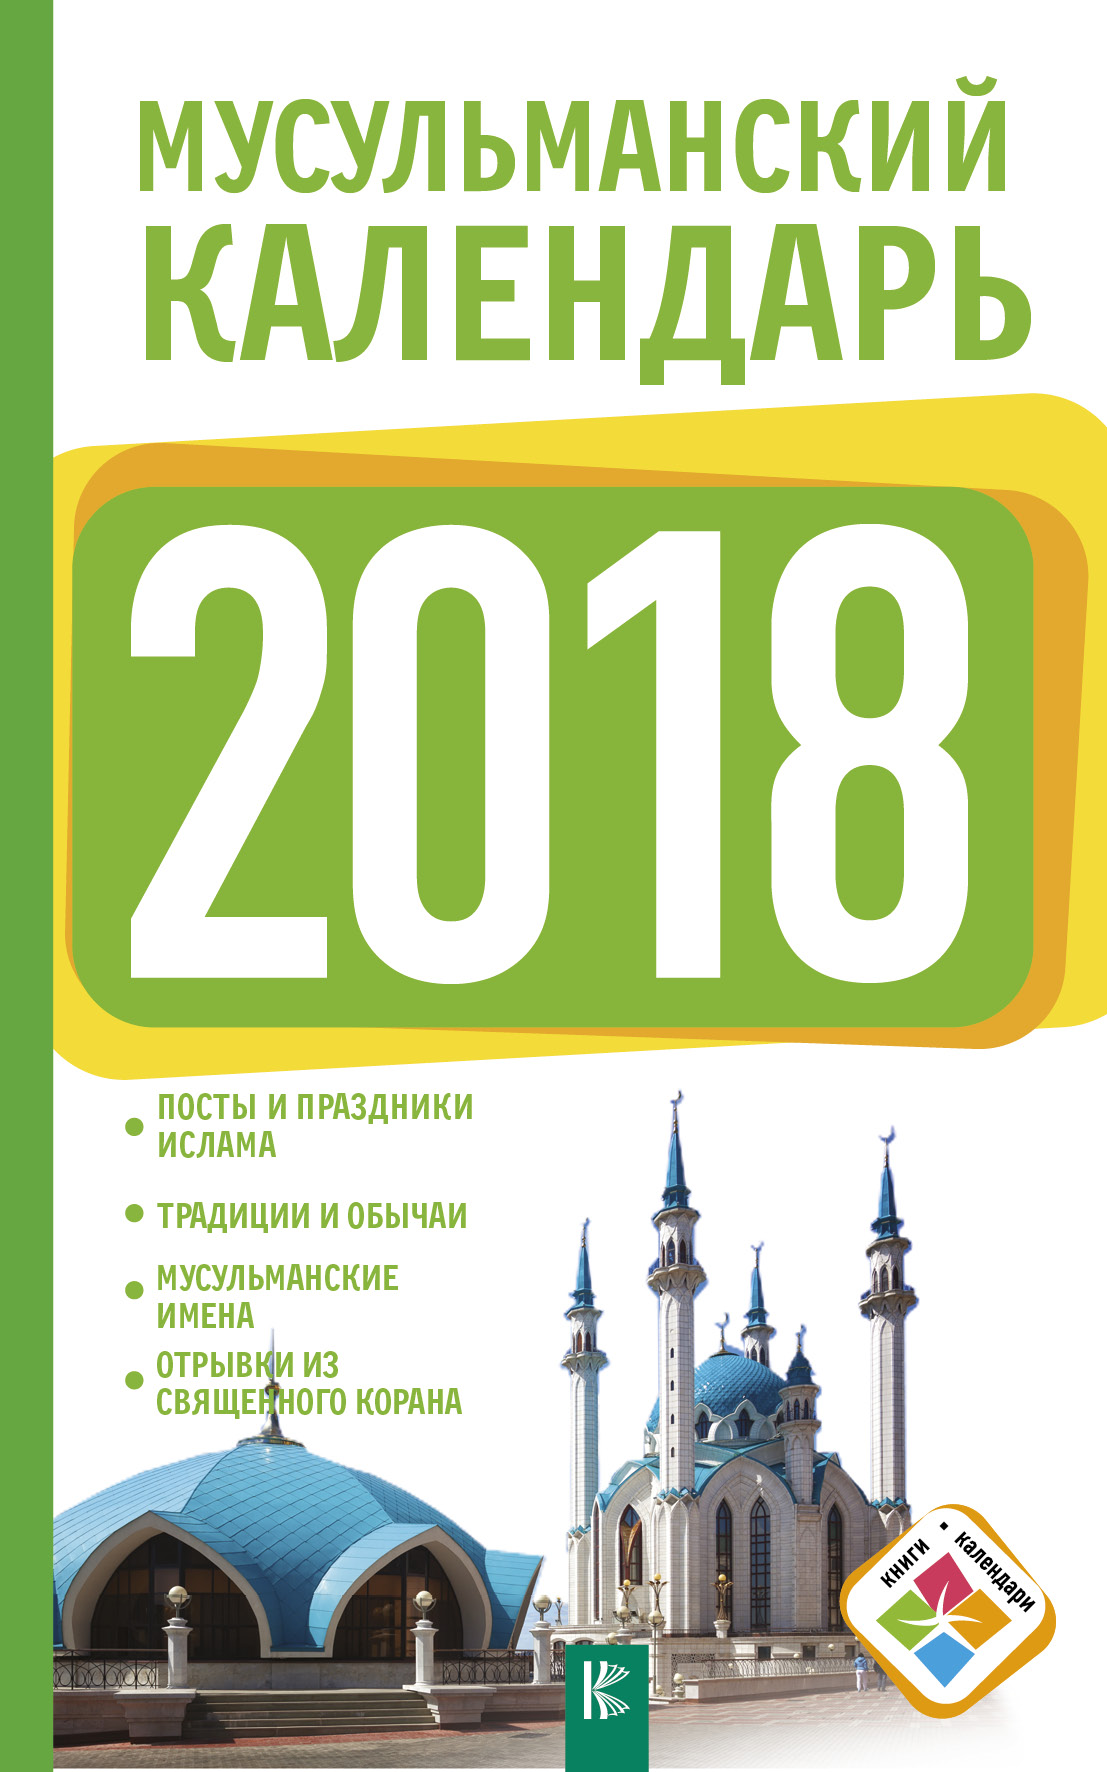 Хорсанд Д.В. Мусульманский календарь на 2018 год